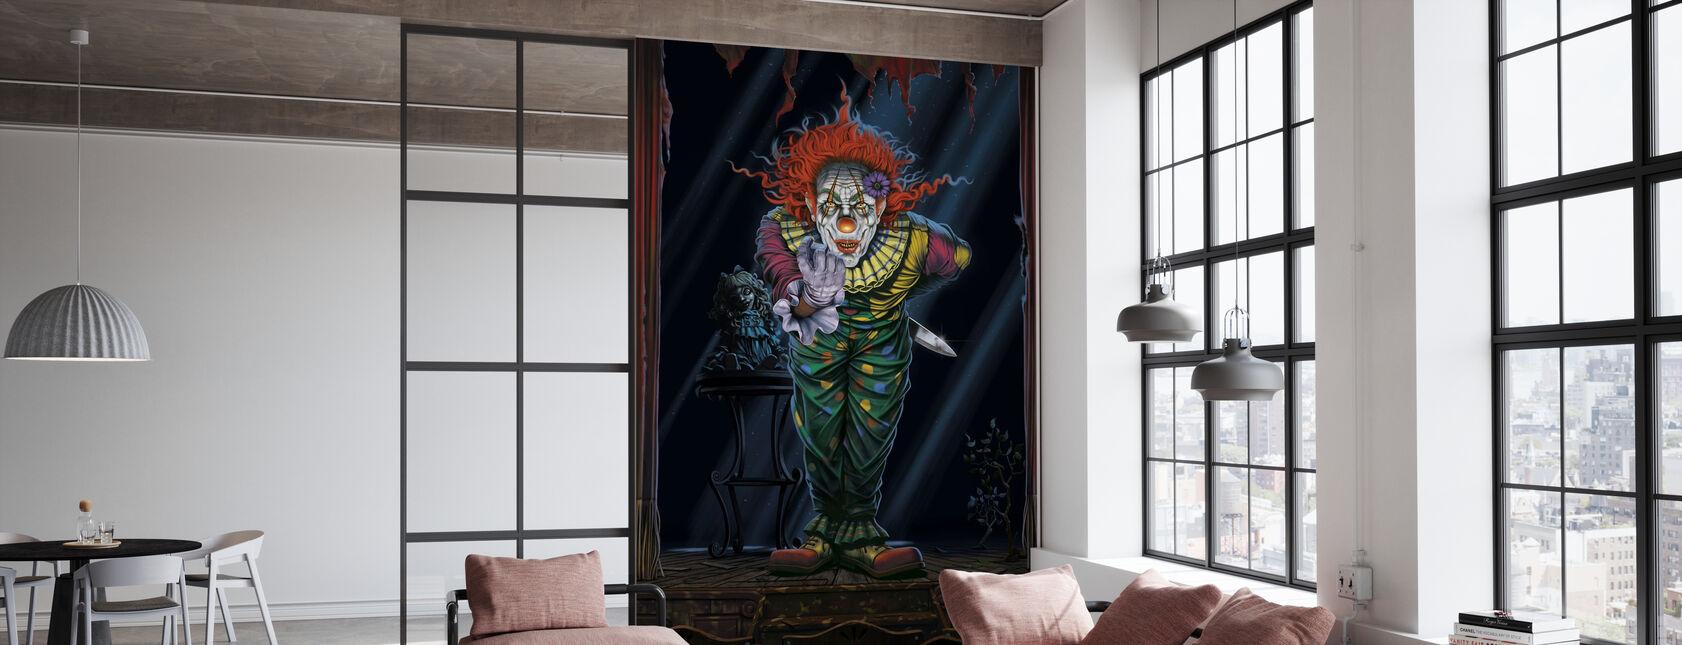 Surprise Clown - Wallpaper - Office